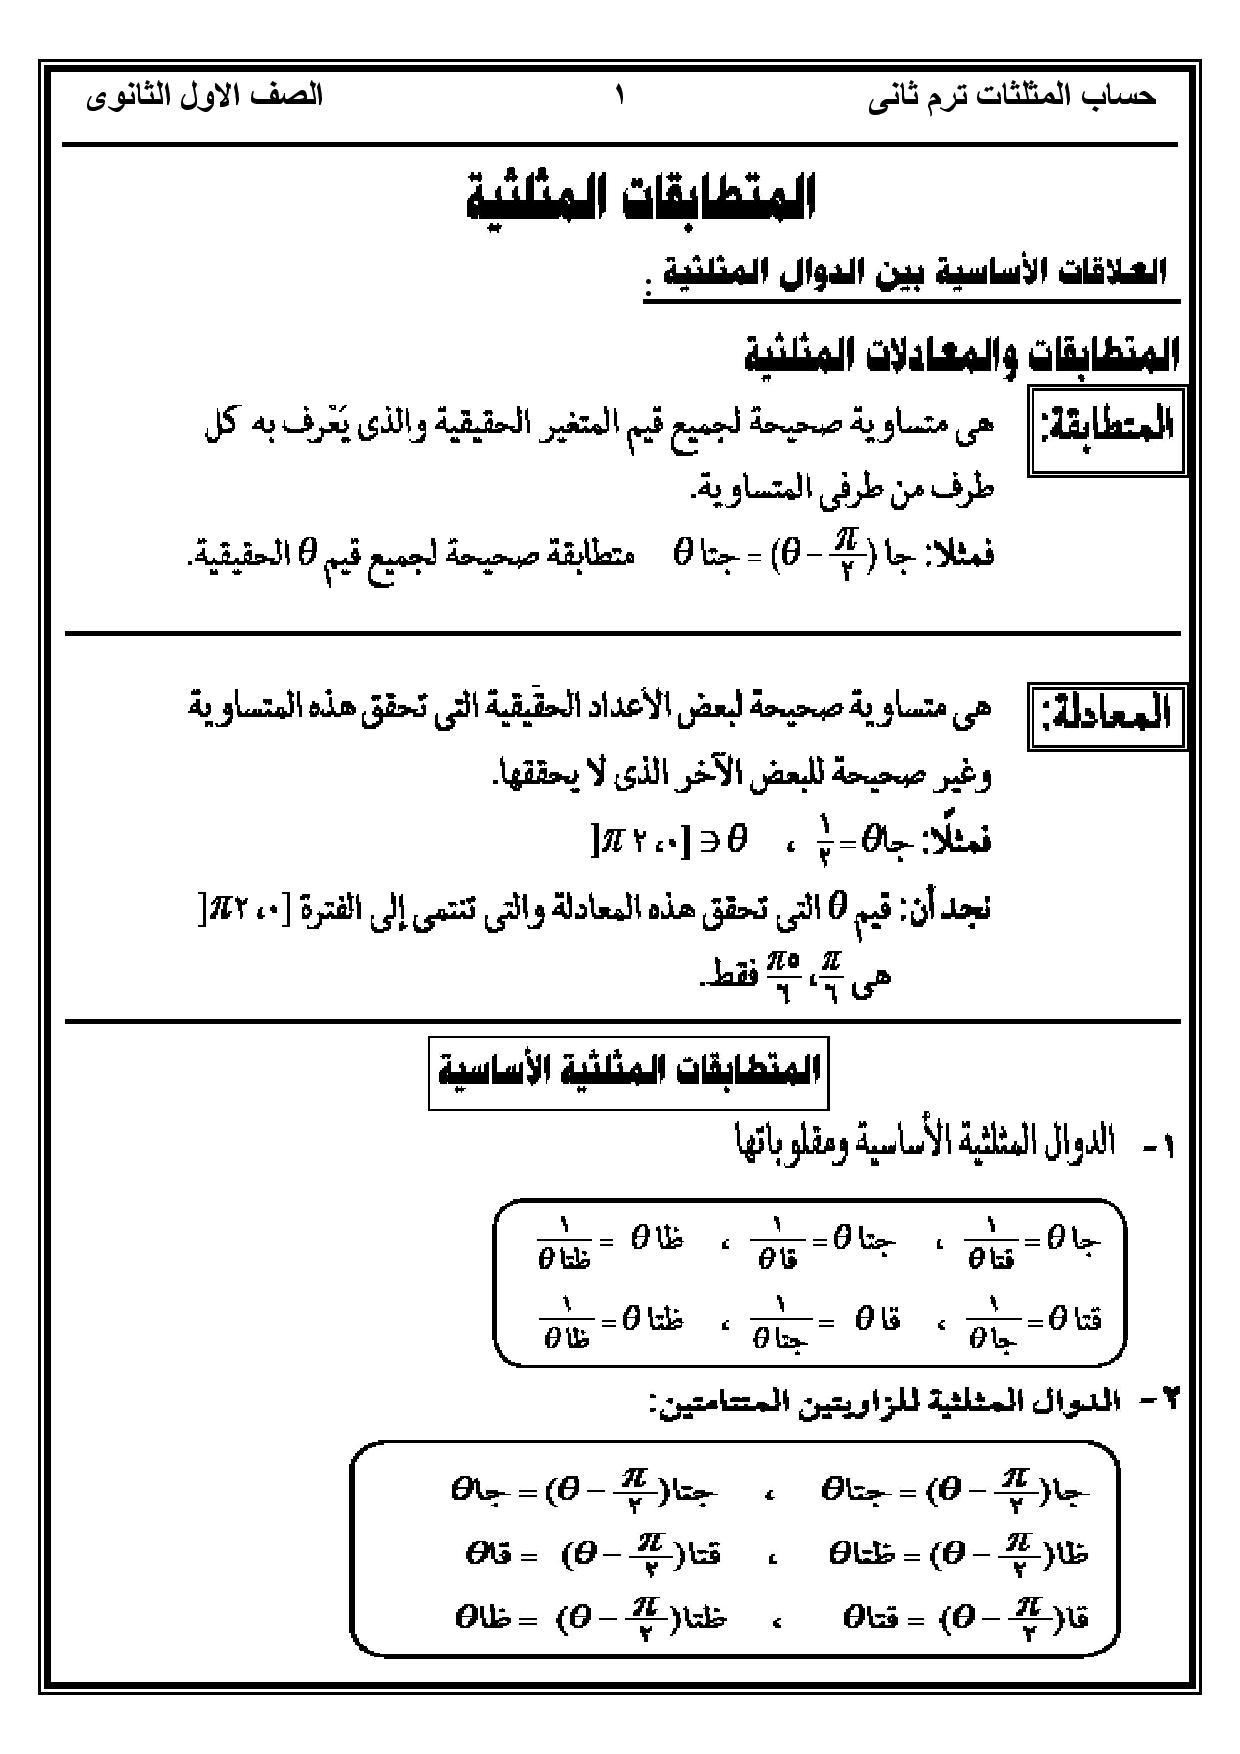 exam-eg.com_1490117300851.jpg